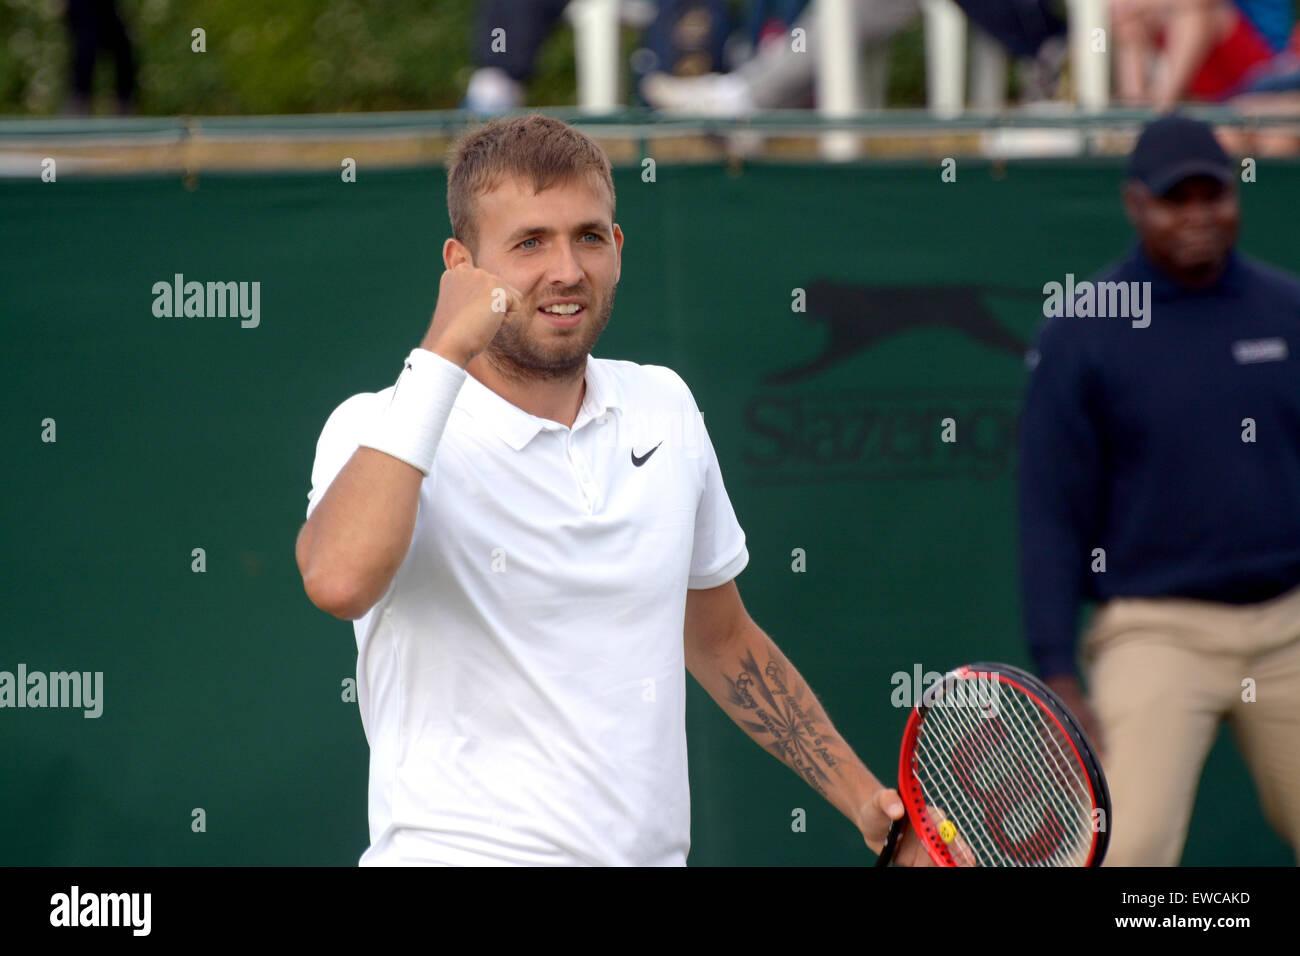 Wimbledon, London, UK. 22nd June, 2015. Bank of England Sports Grounds Roehampton London England 22nd JUne 2015. Stock Photo